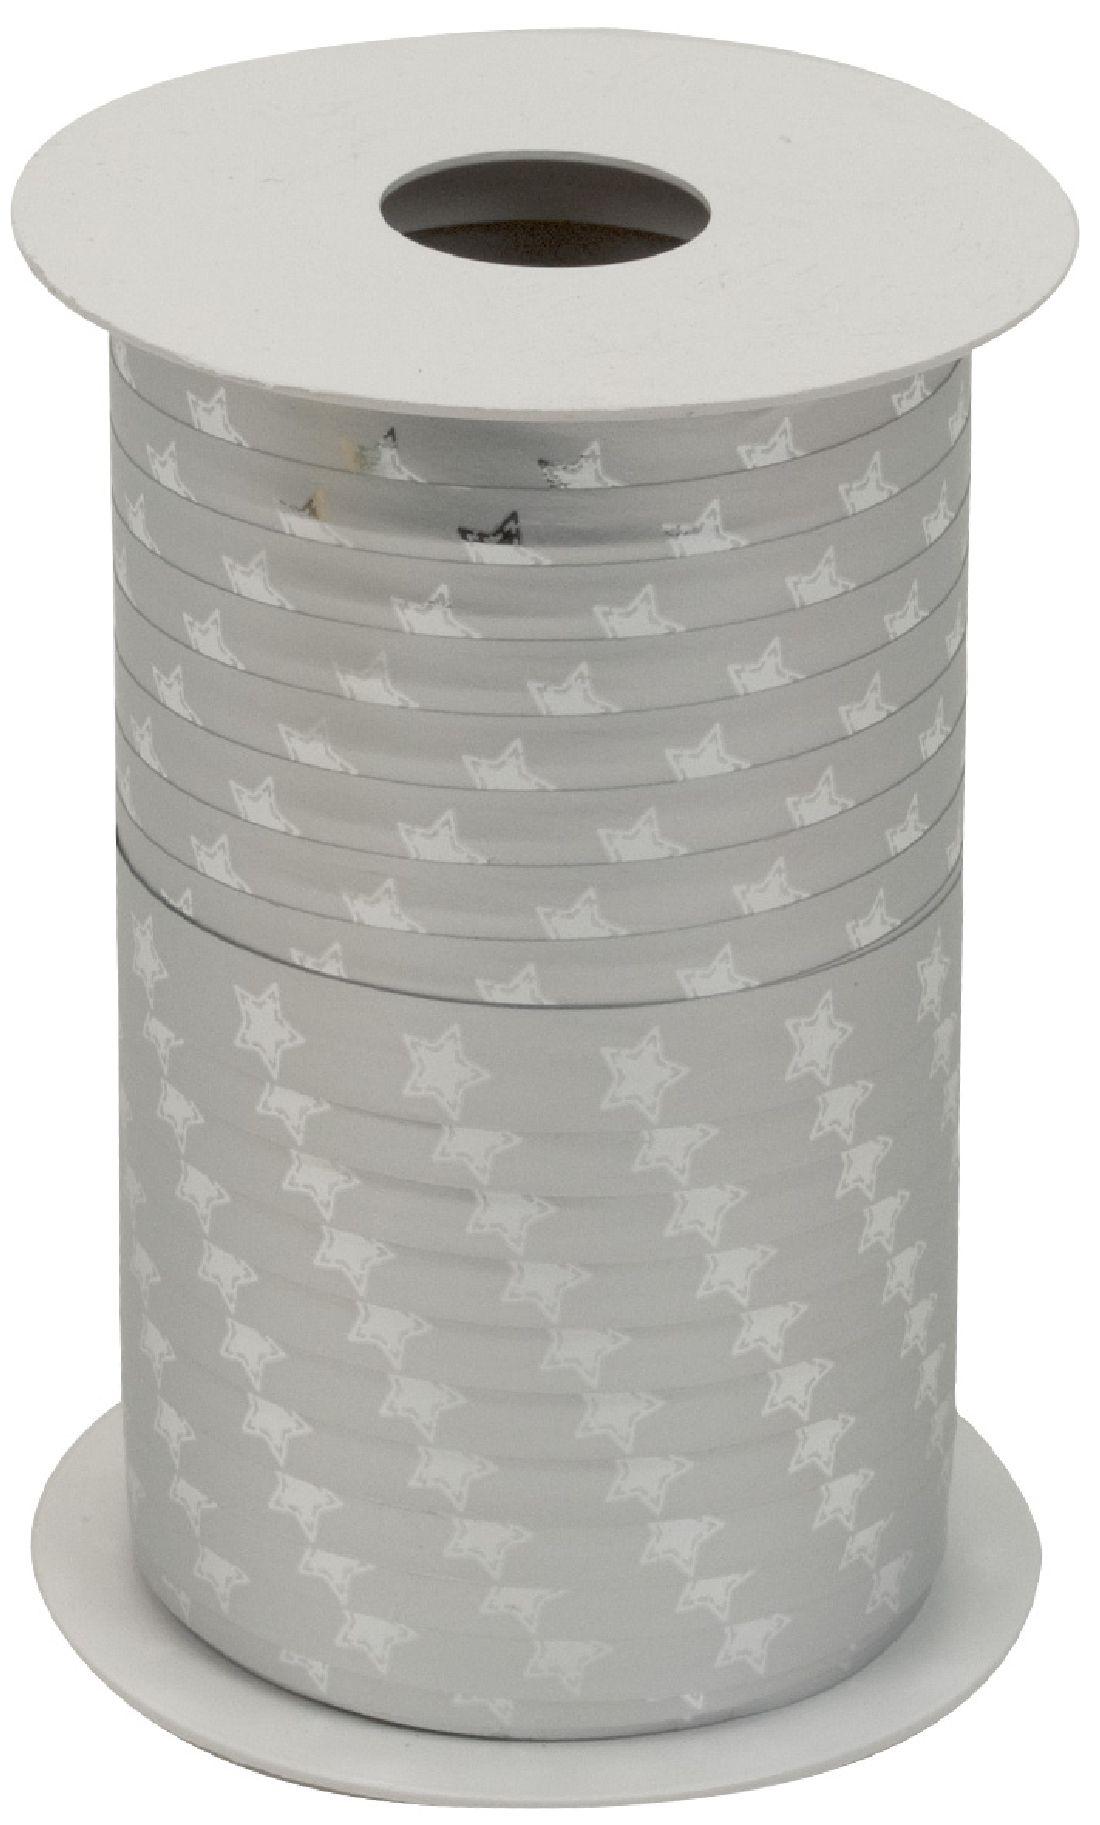 Polyband X-MAS Edition SILBER METALLIC Ringelband 10mm 150Meter Ziehband